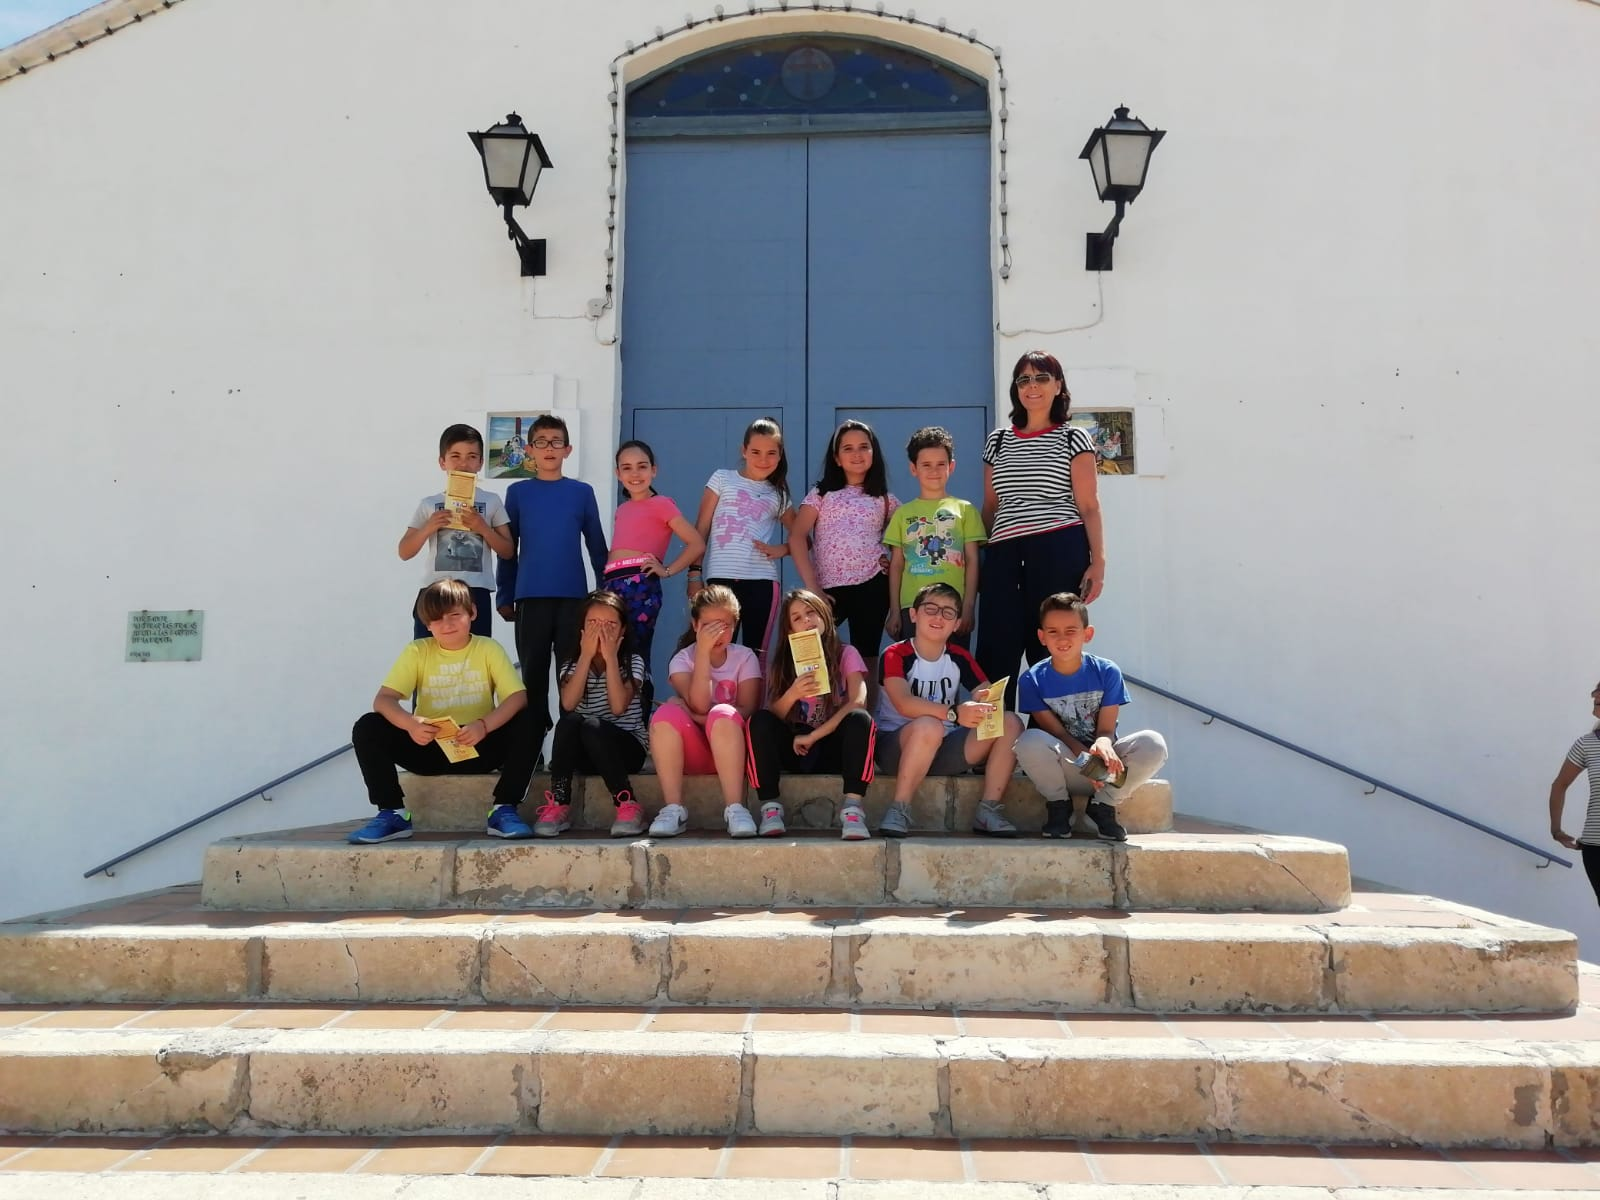 (2019-05-23) Visita ermita alumnos Laura - 3 C primaria - Reina Sofia - María Isabel Berenguer (01)